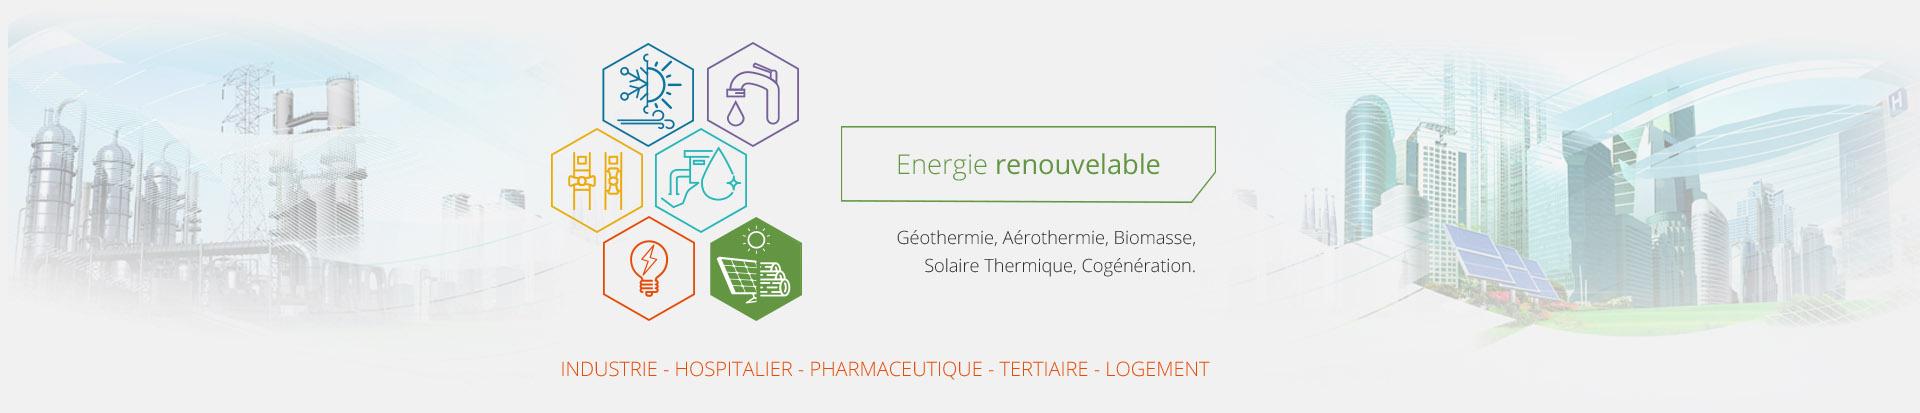 énergies renouvelables en rhône alpes